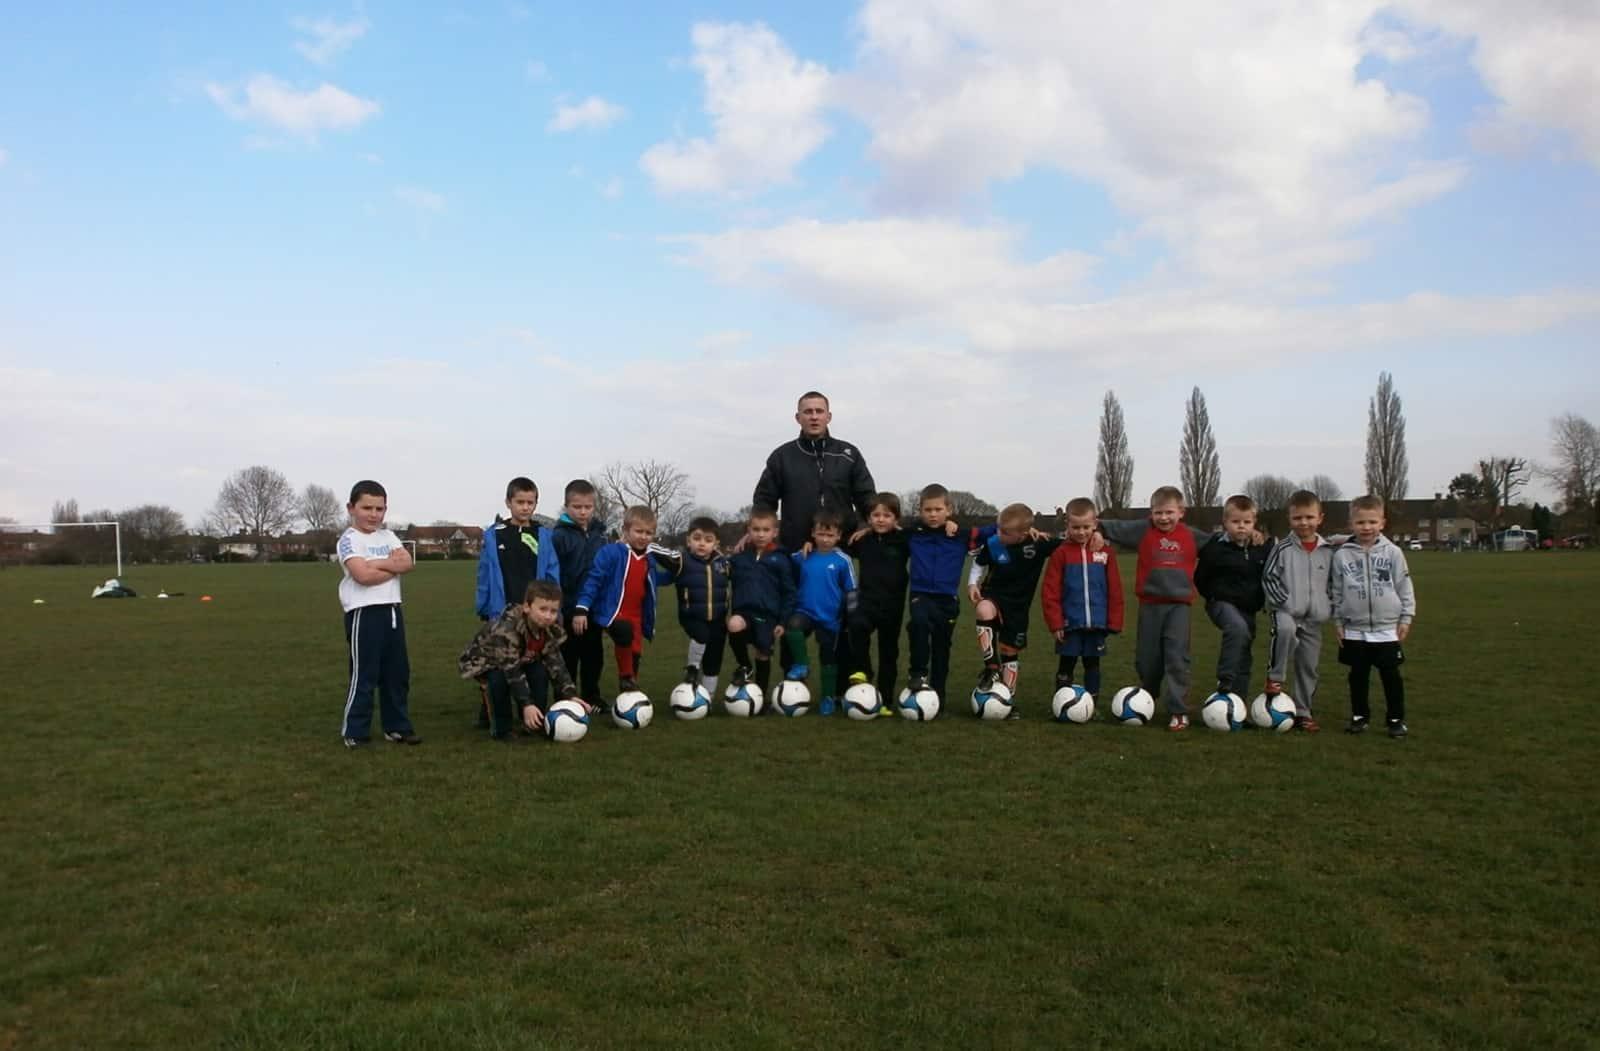 Coventry Football Academy - Szkółka Piłkarska Coventry